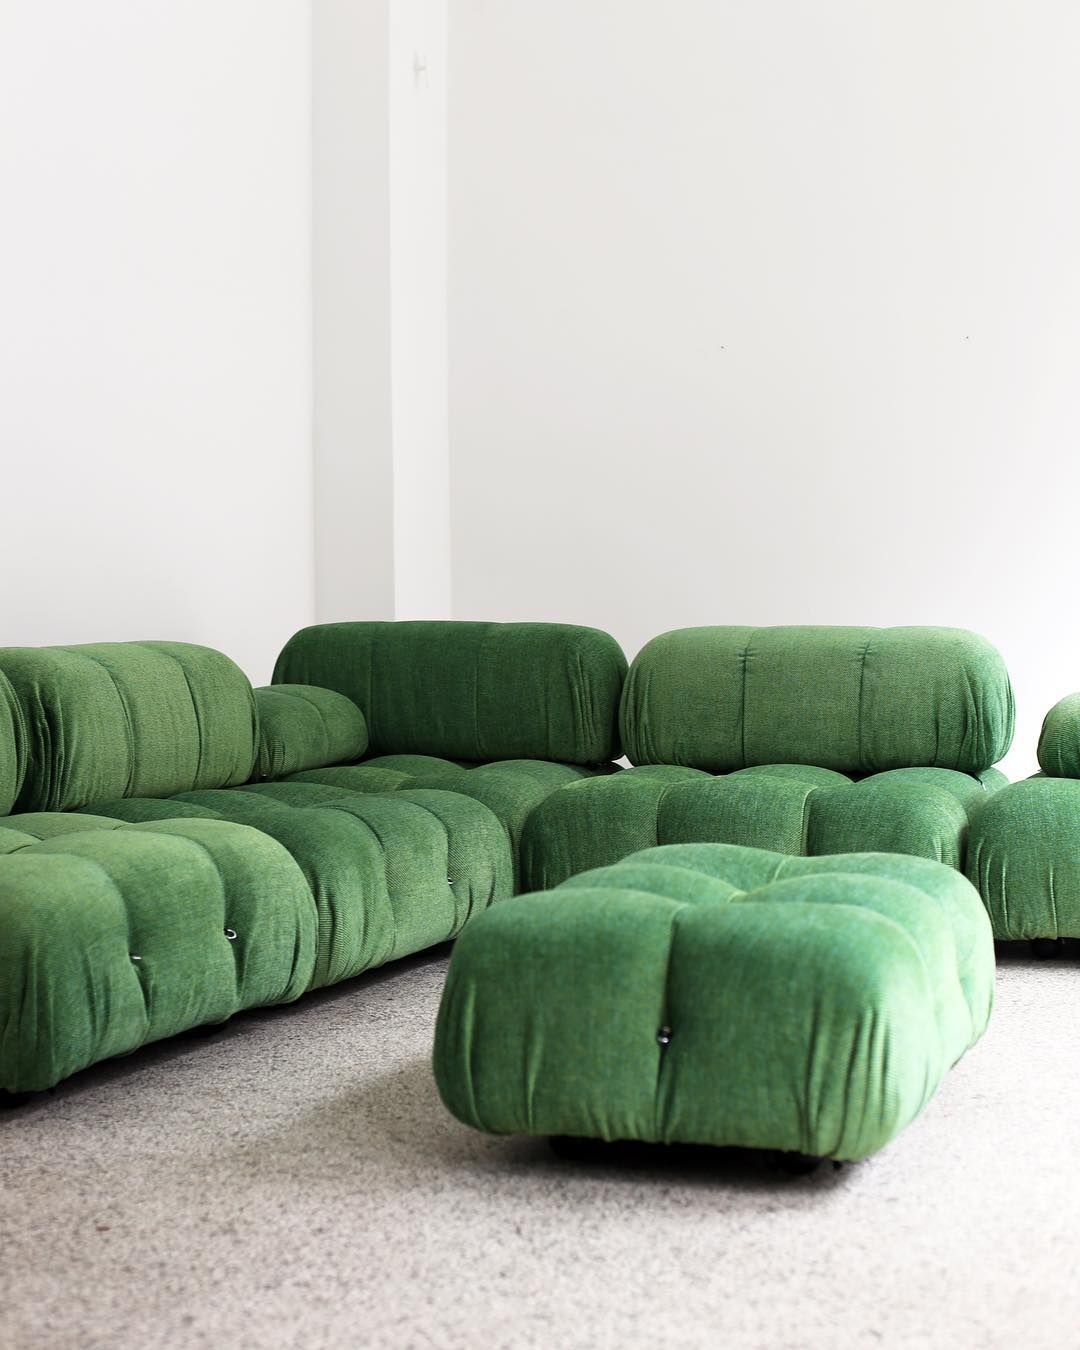 Modernes Ledersofa Stoffsofa Modular Design Mobel Bei Mobelhaus Dusseldorf Modernes Ledersofa Ecksofa Design Sofa Design